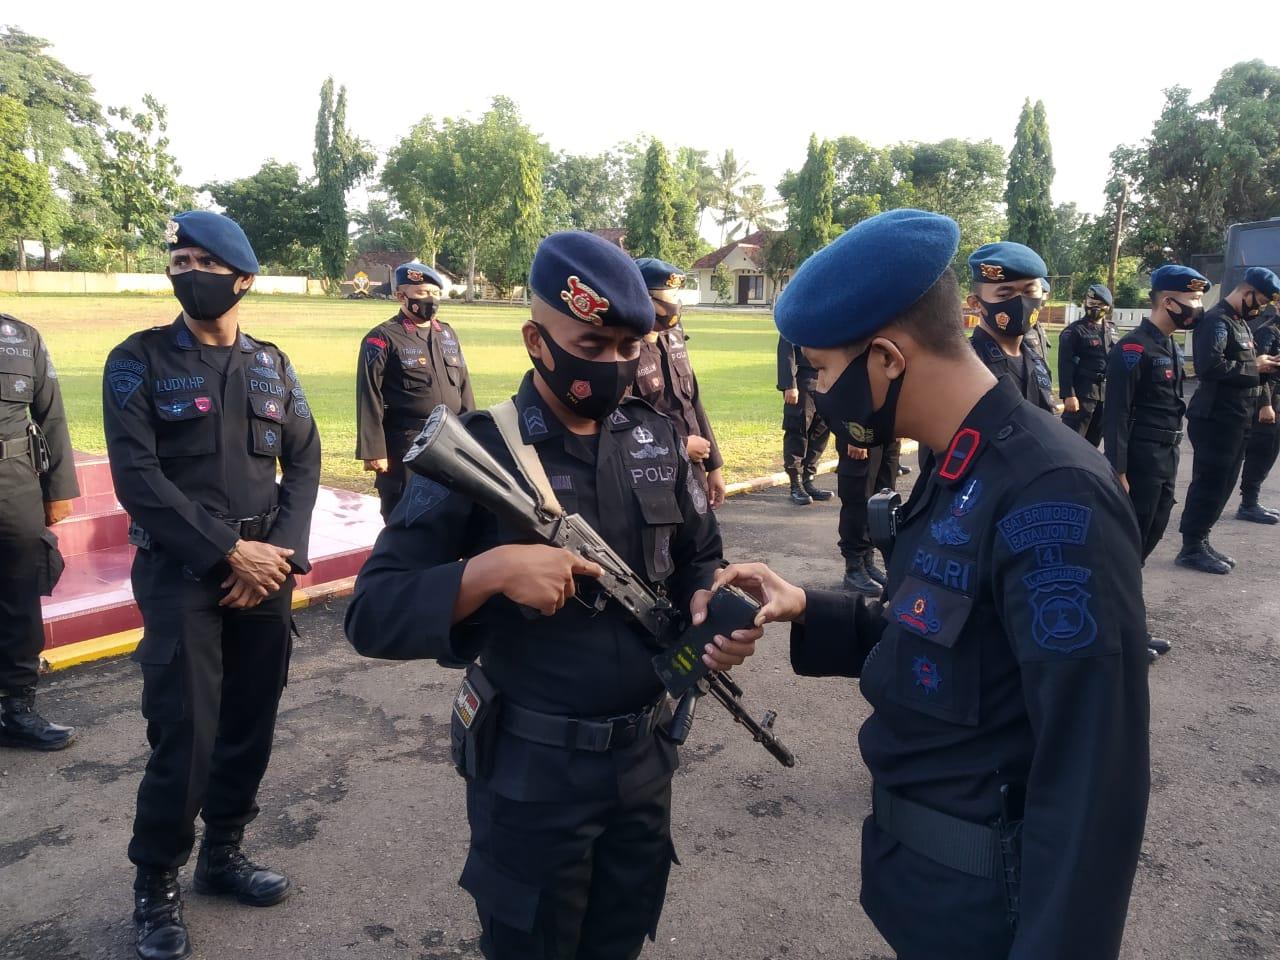 Personel Yon B Pelopor amankan aksi massa pendudukan lahan PT. Tunas Baru Lampung.Tbk.